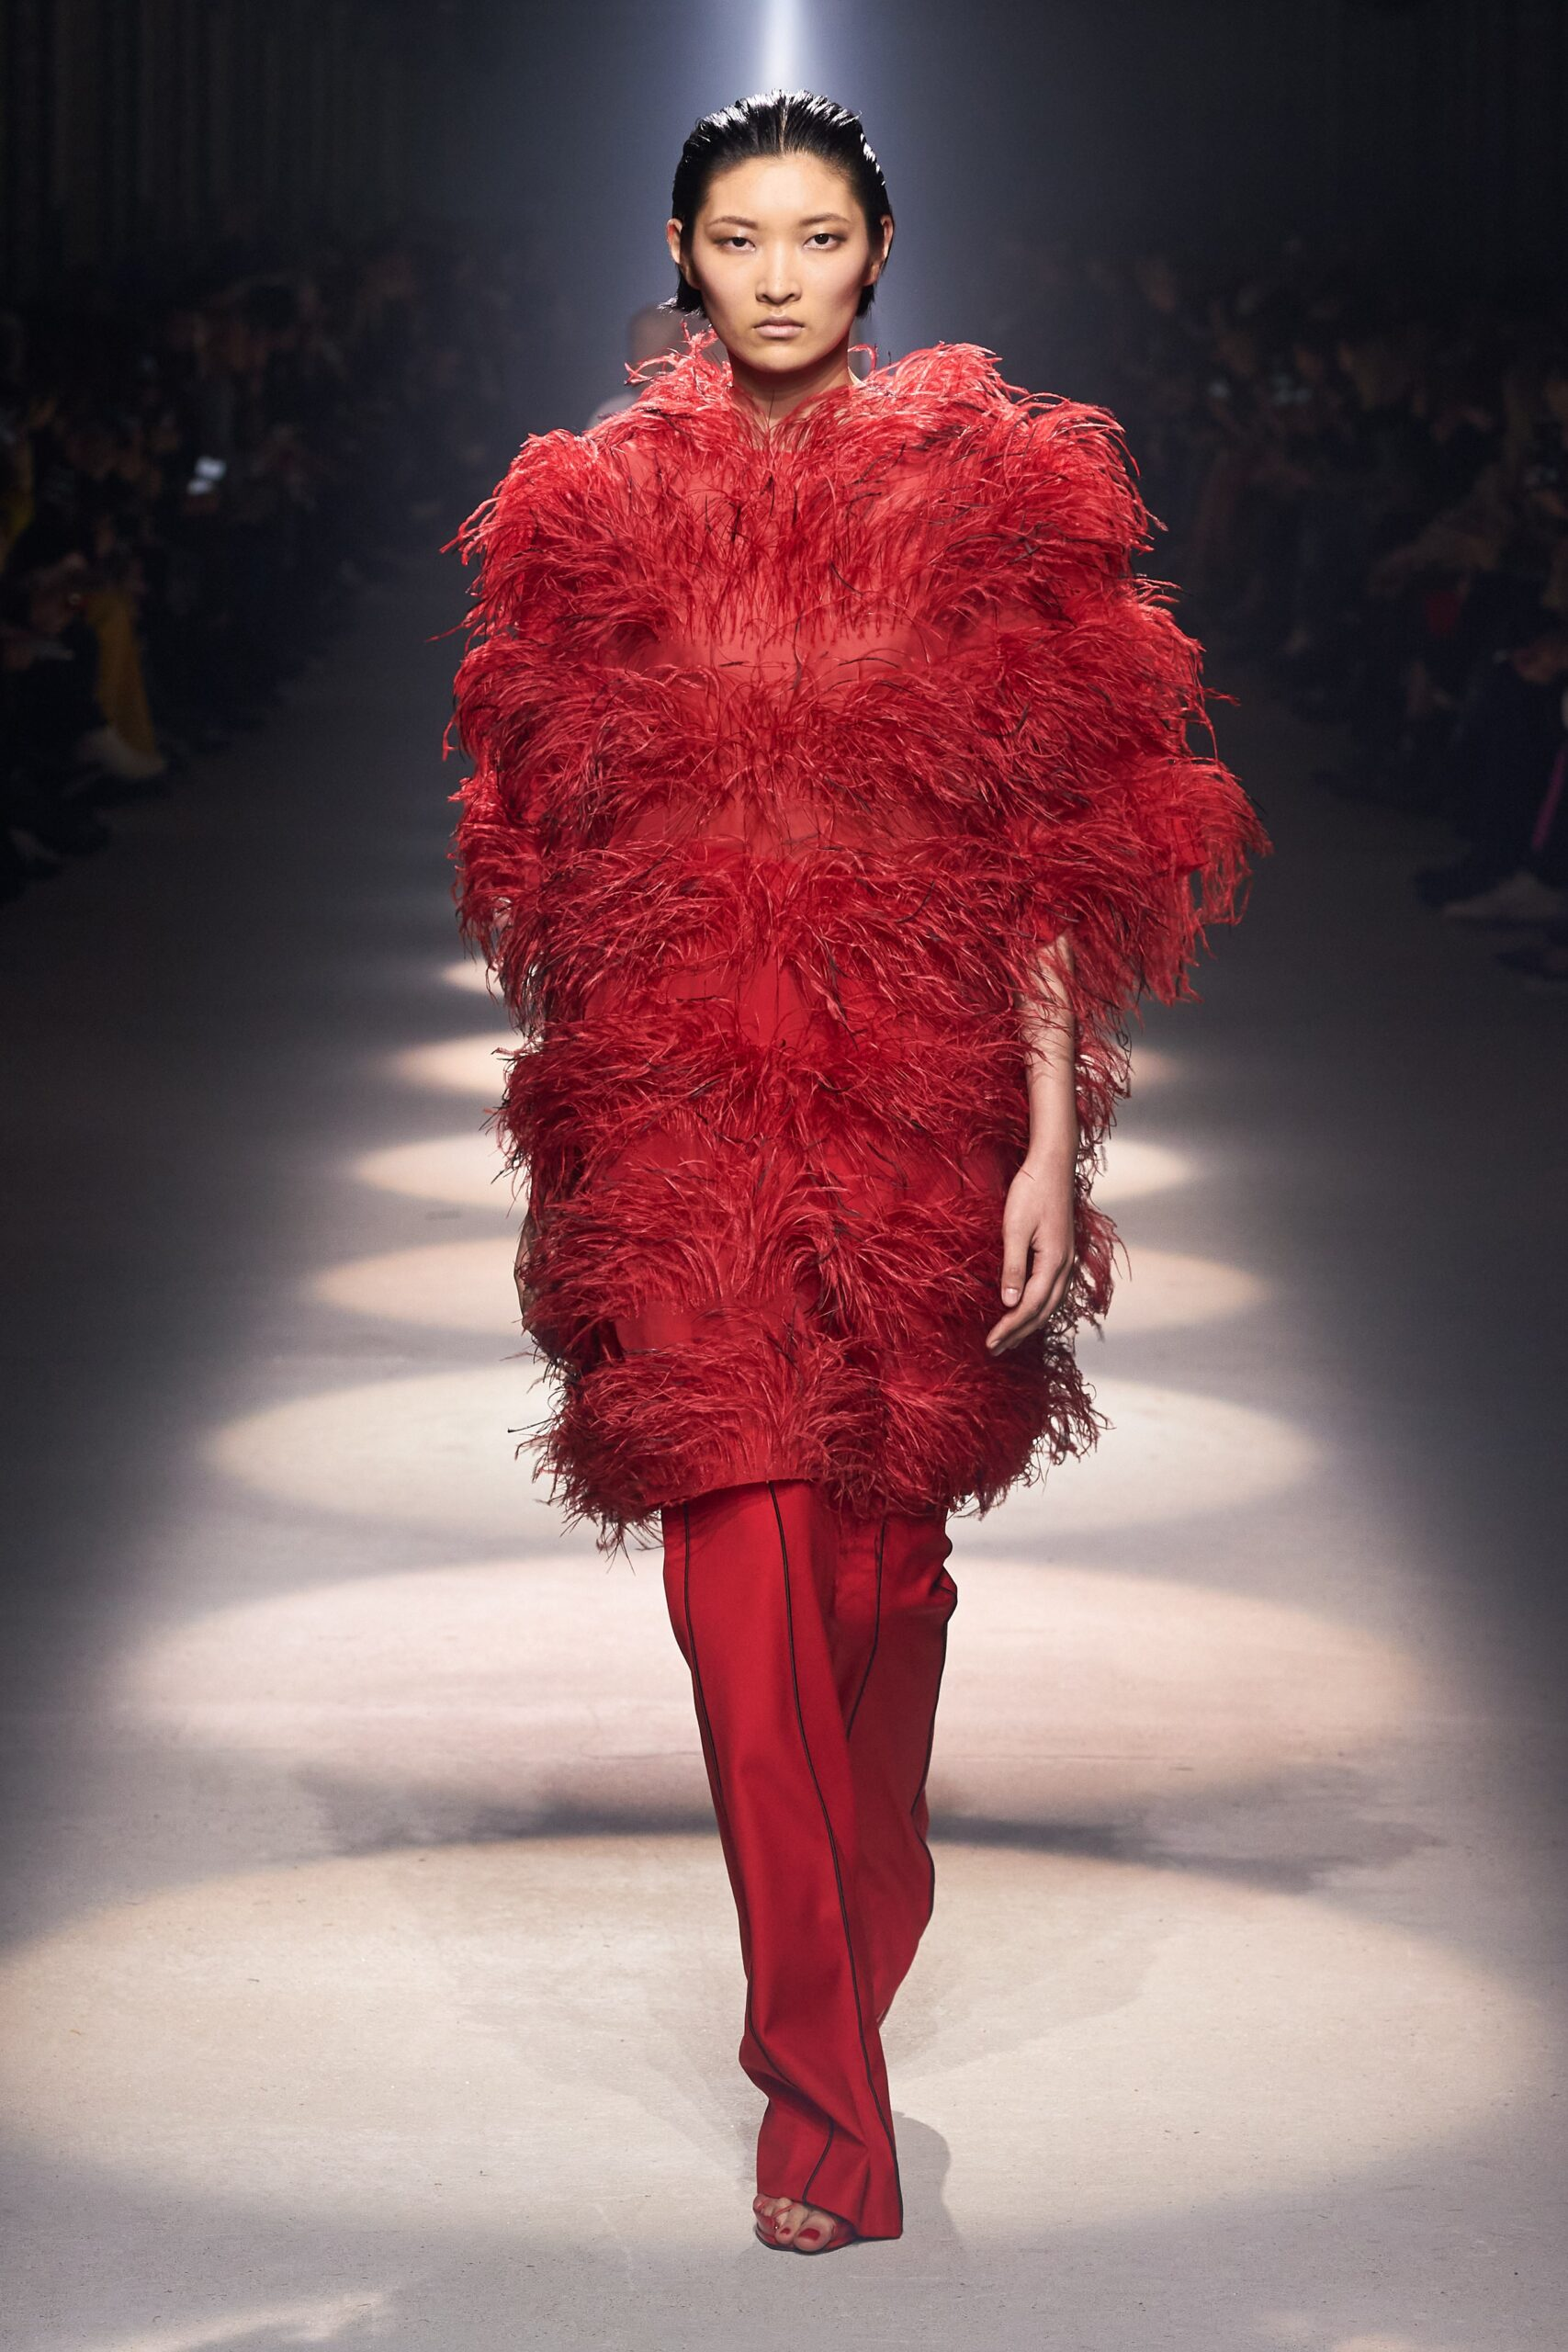 Givenchy Fall 2020 ready-to-wear